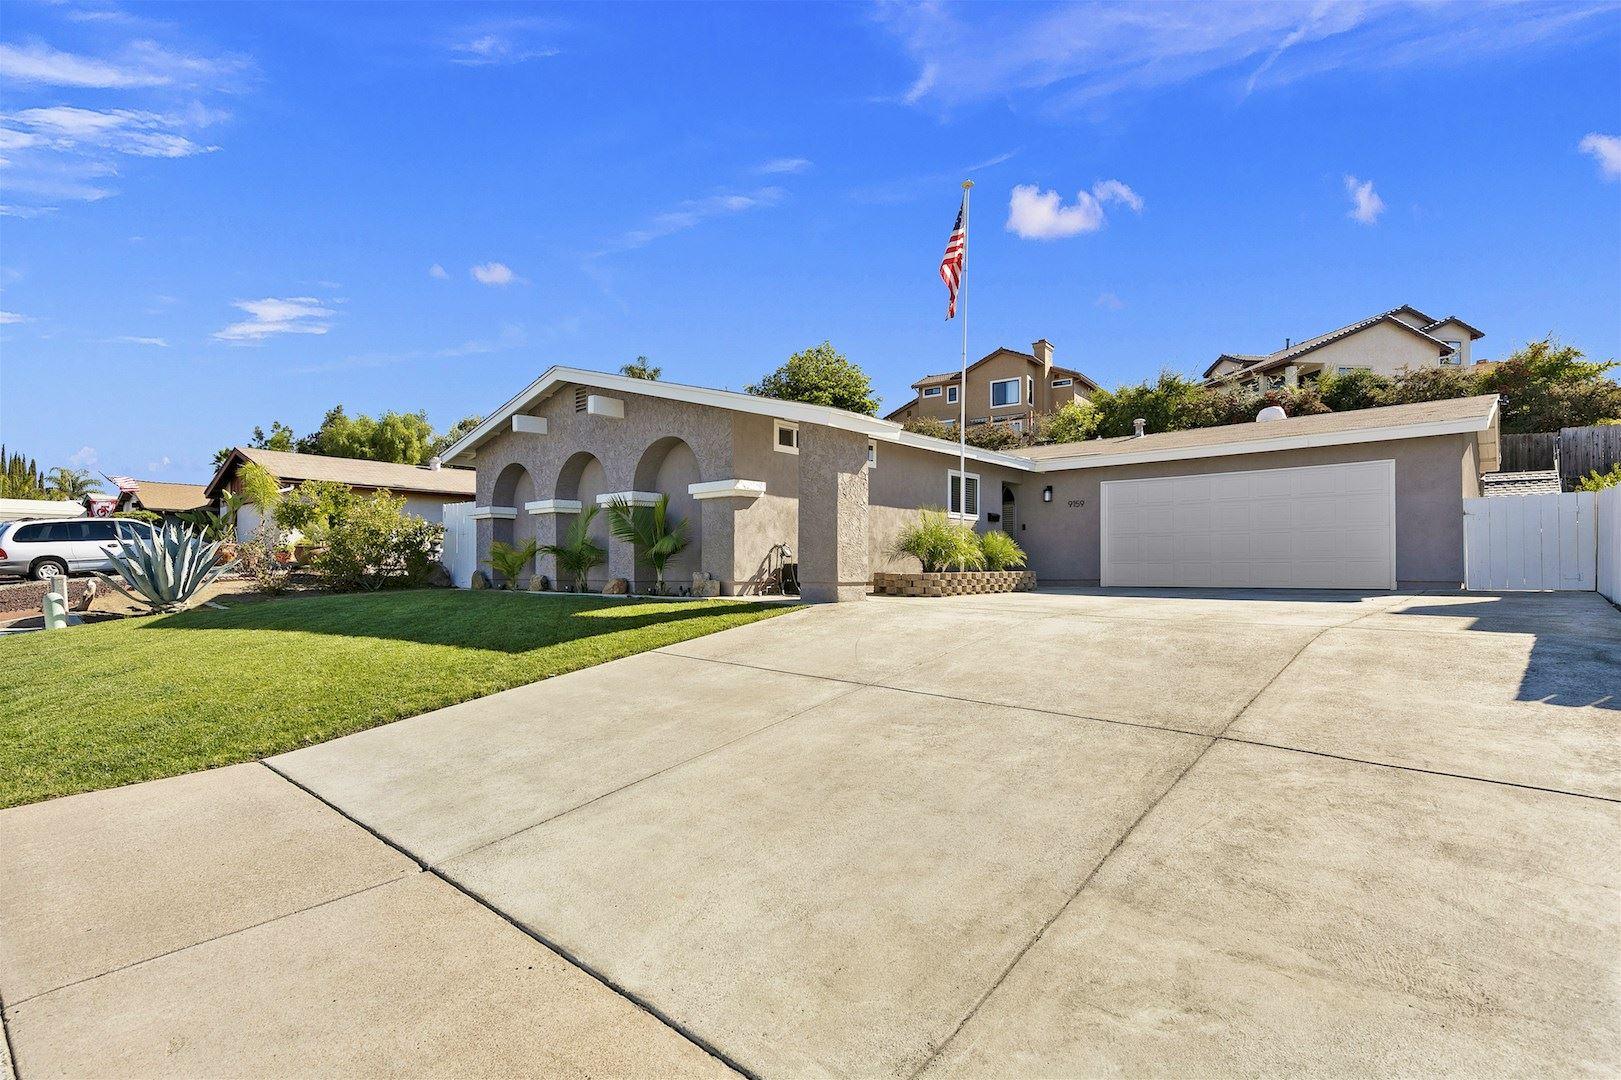 Photo of 9159 Tonya Ln, Santee, CA 92071 (MLS # 200051610)